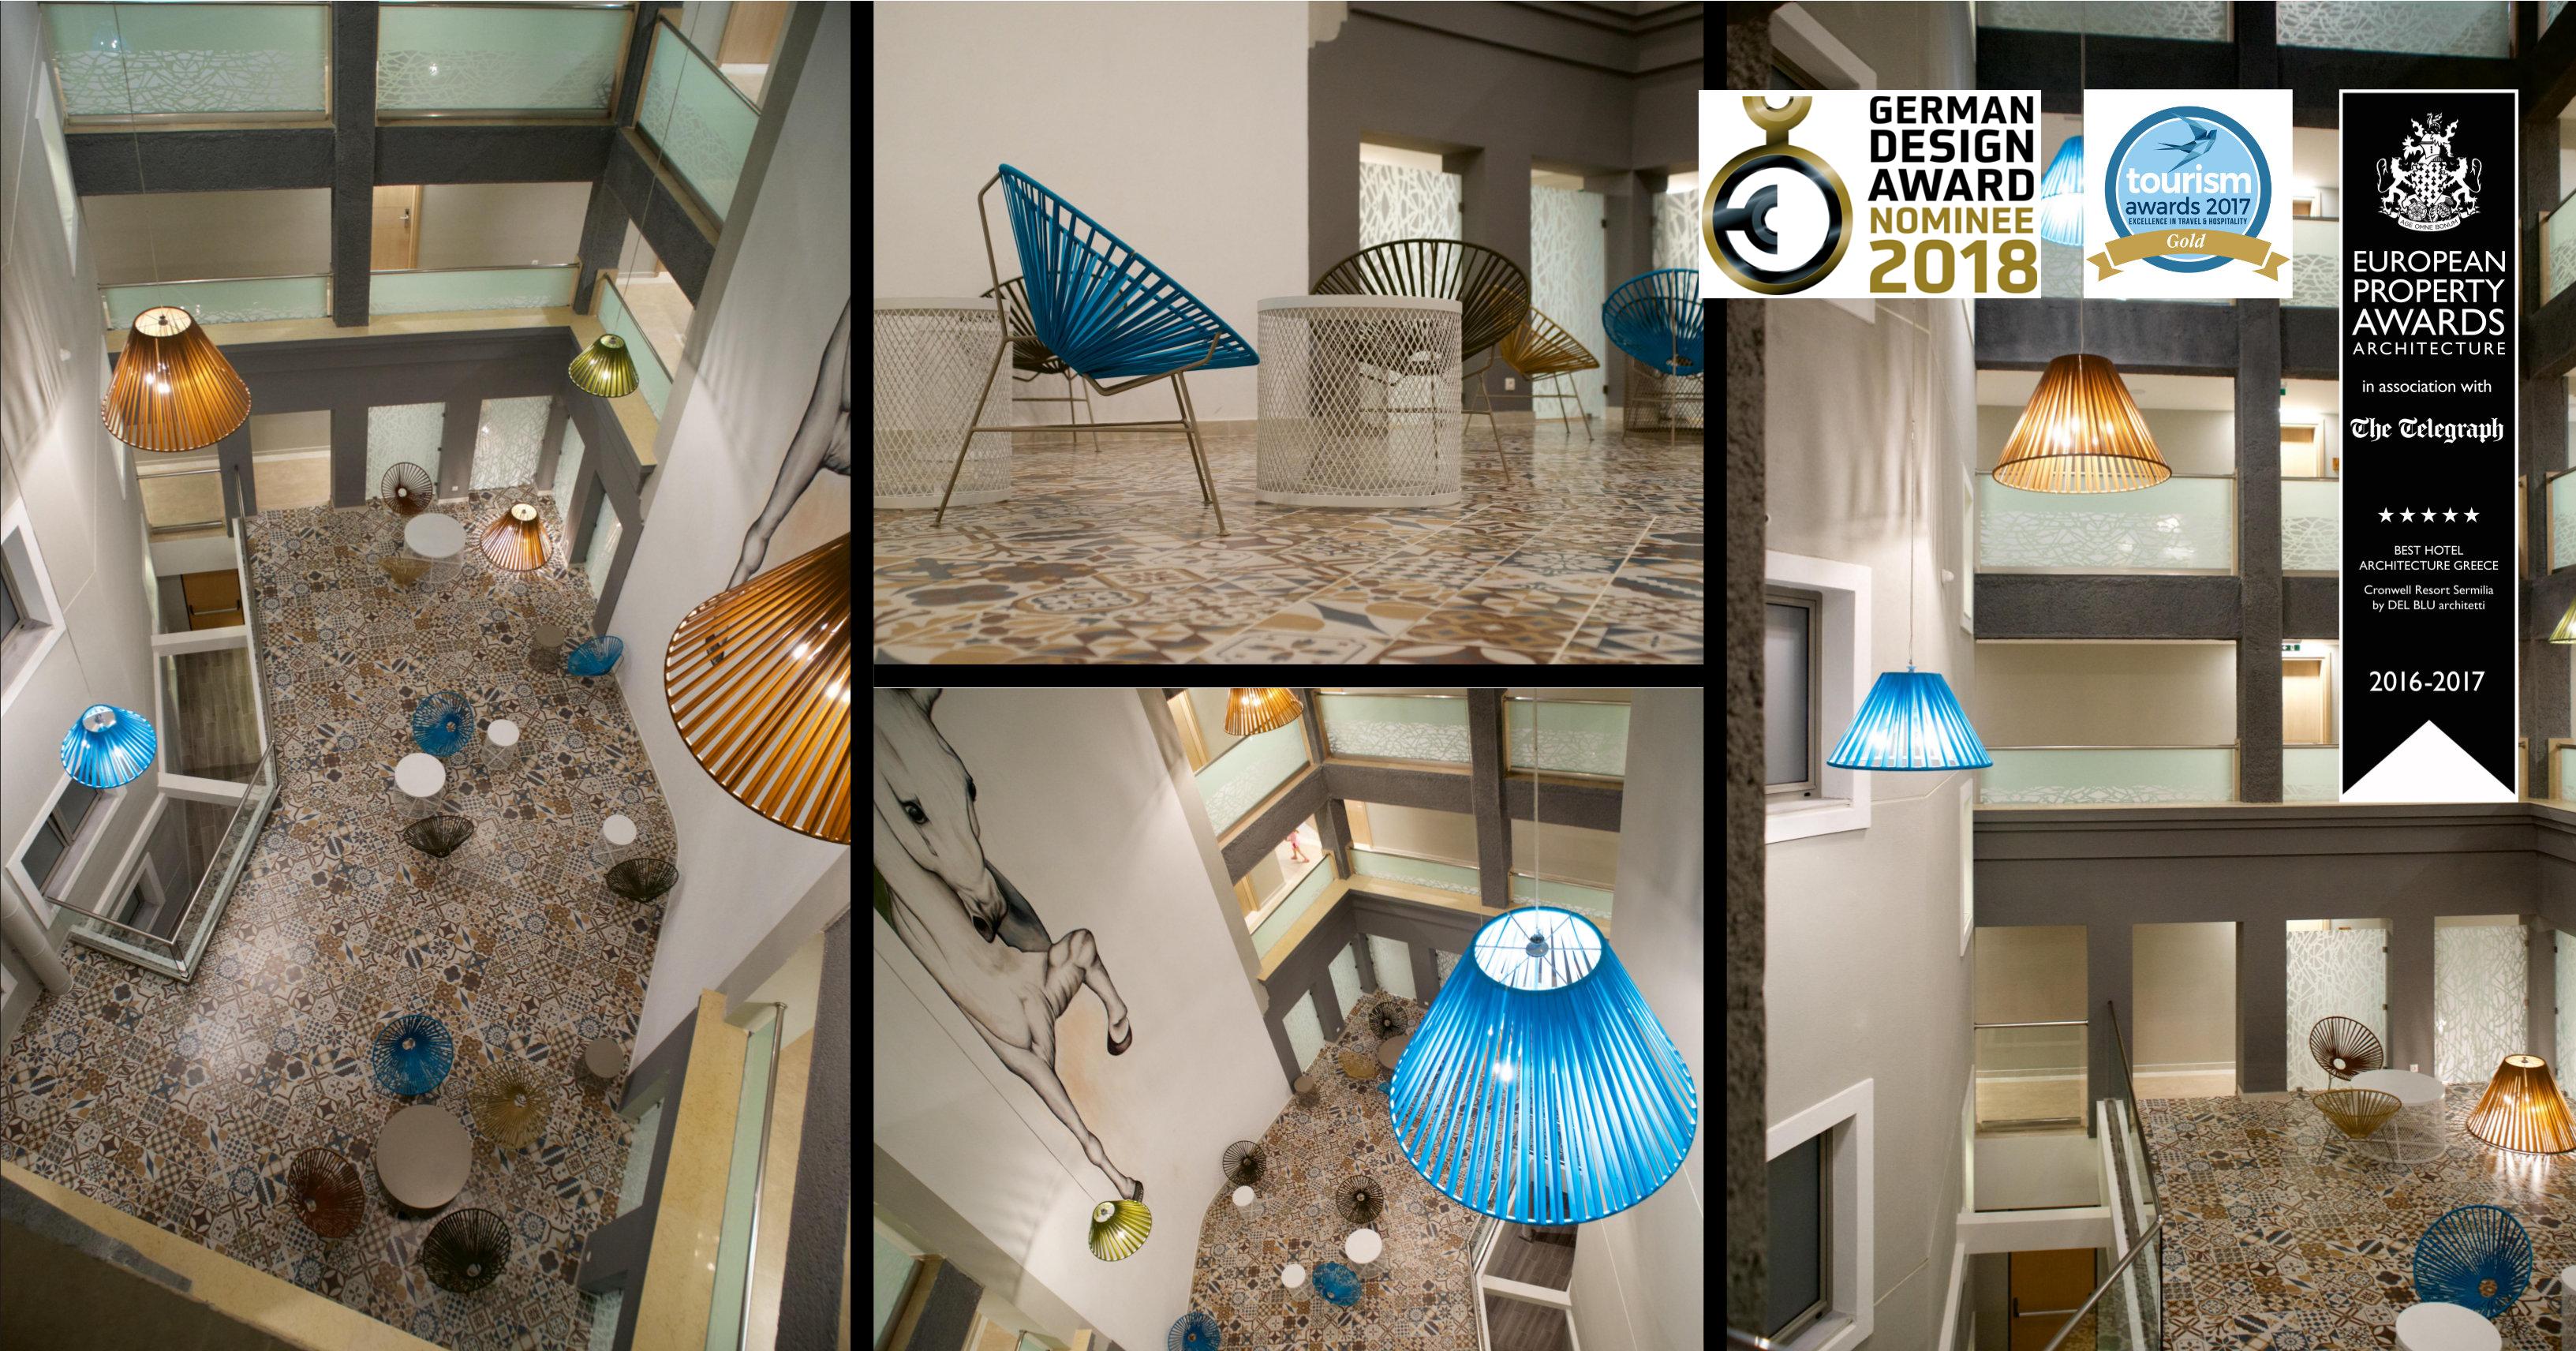 News del blu for Design hotel awards